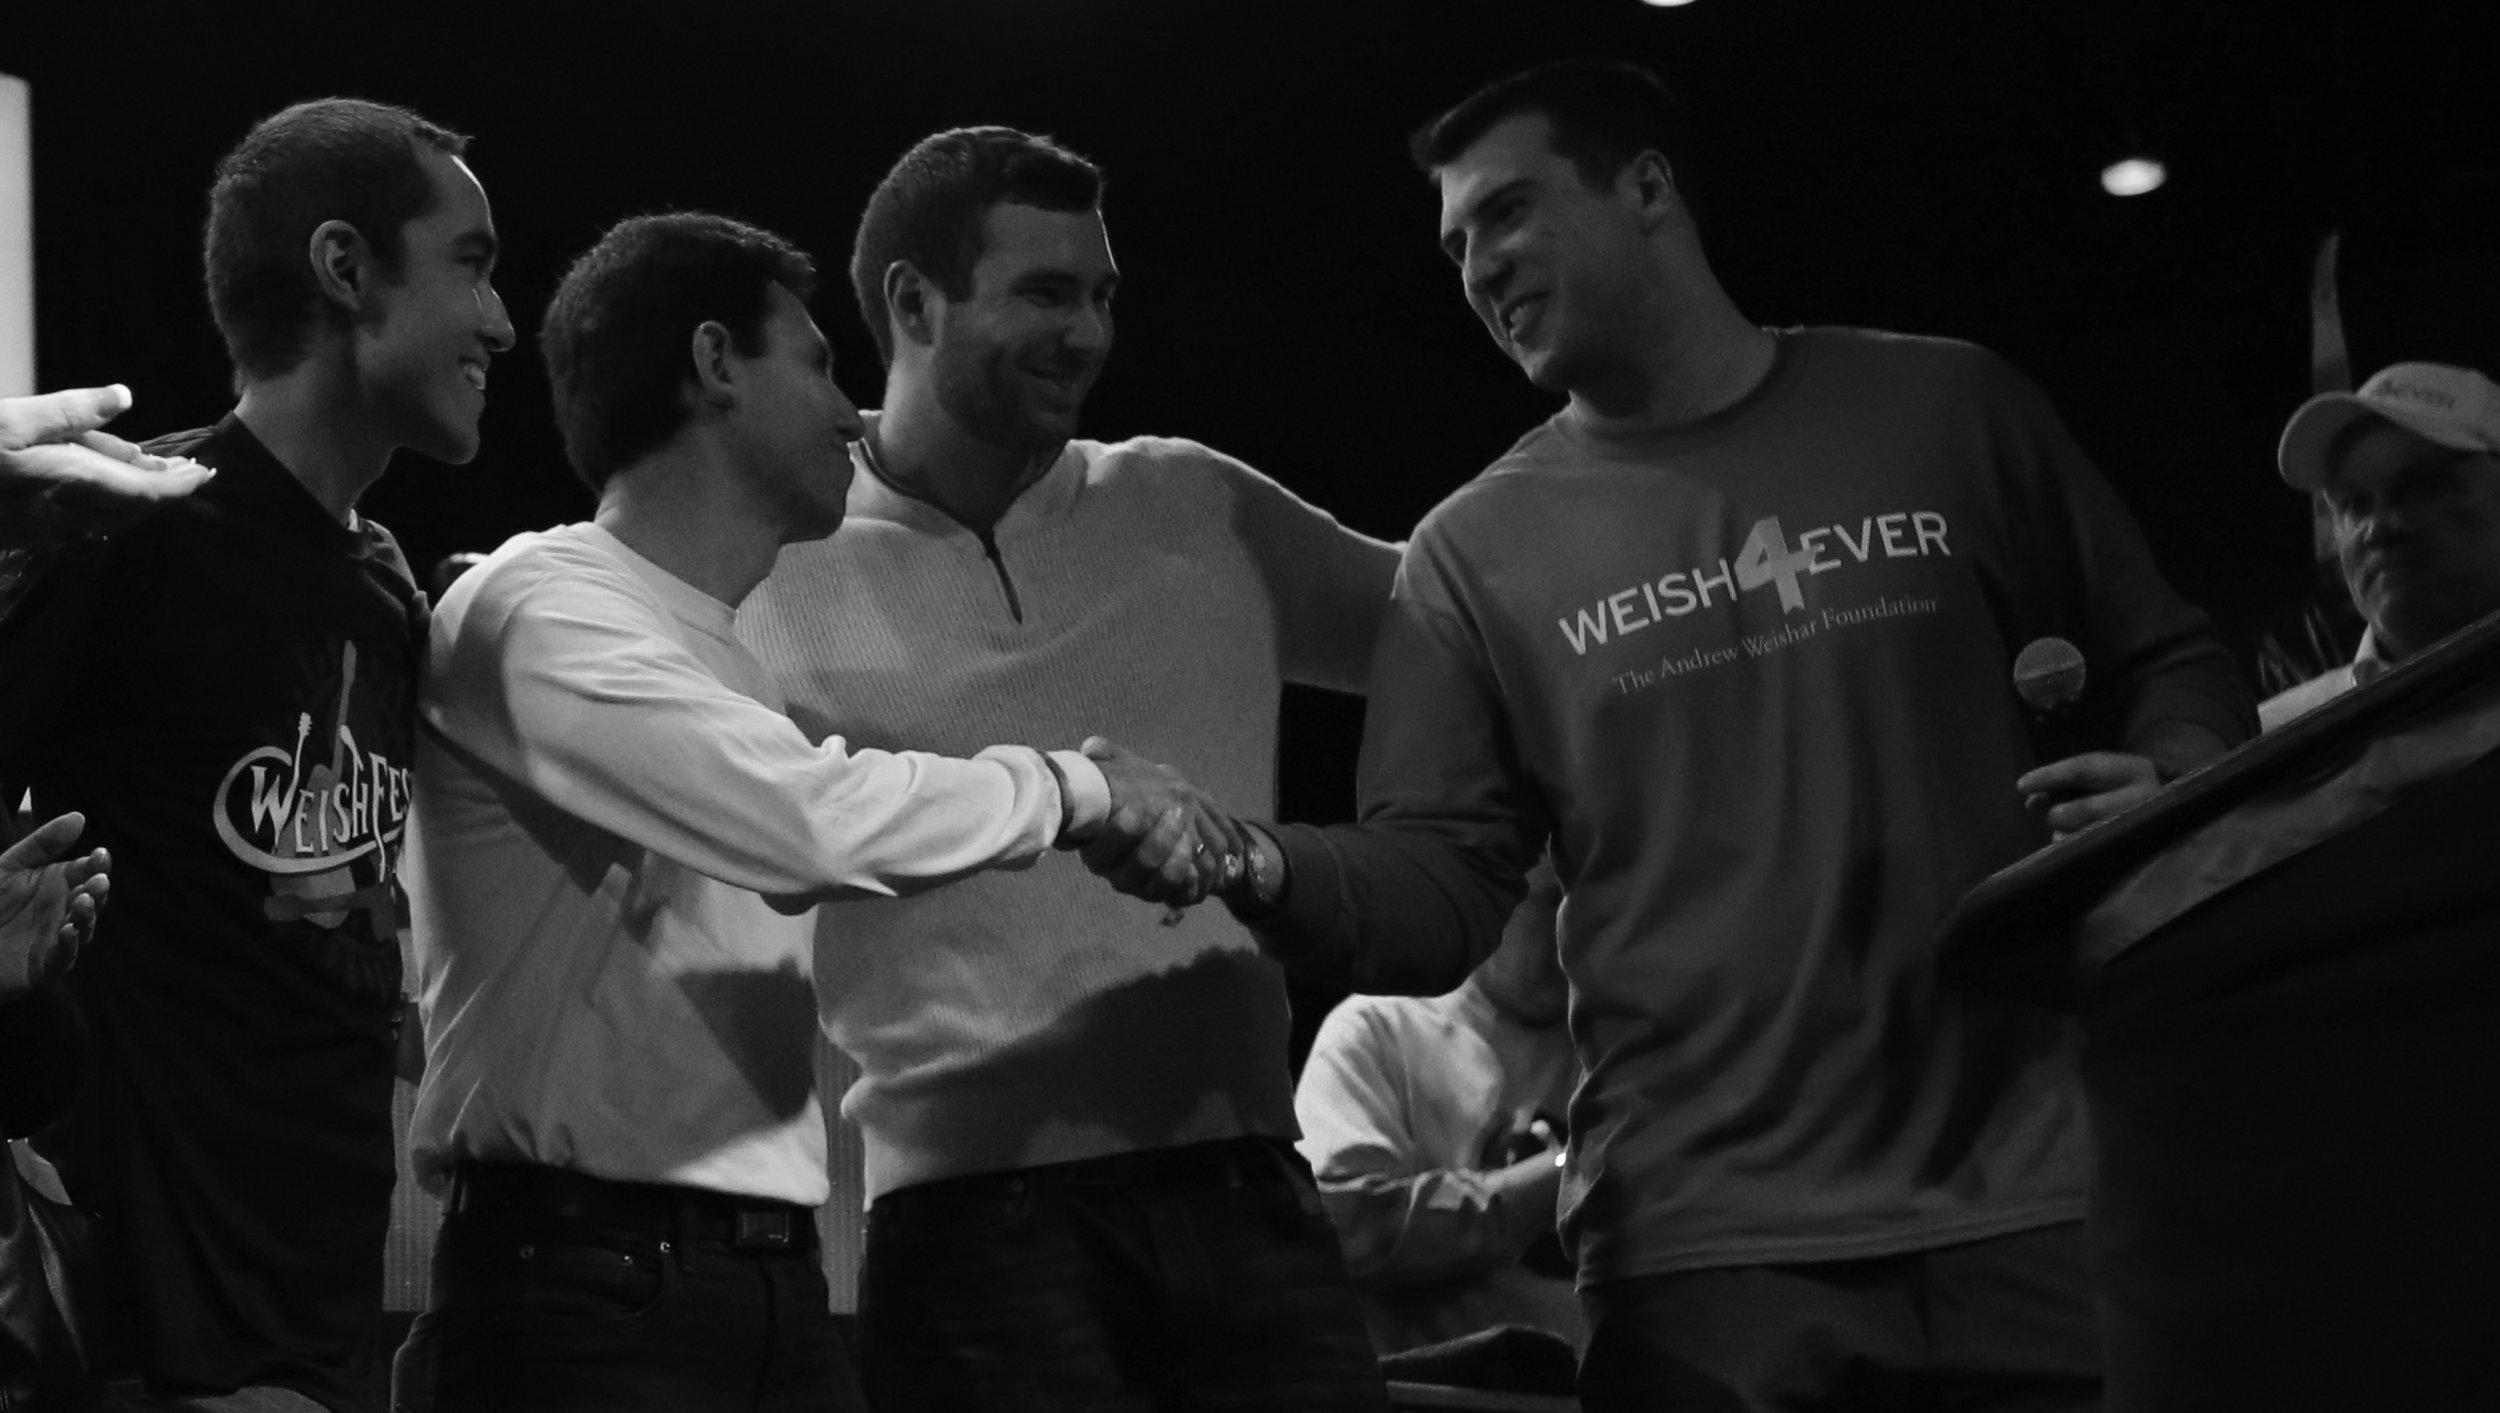 WeishFest 2016 Handshake with Danny Weishar and Nic Weishar